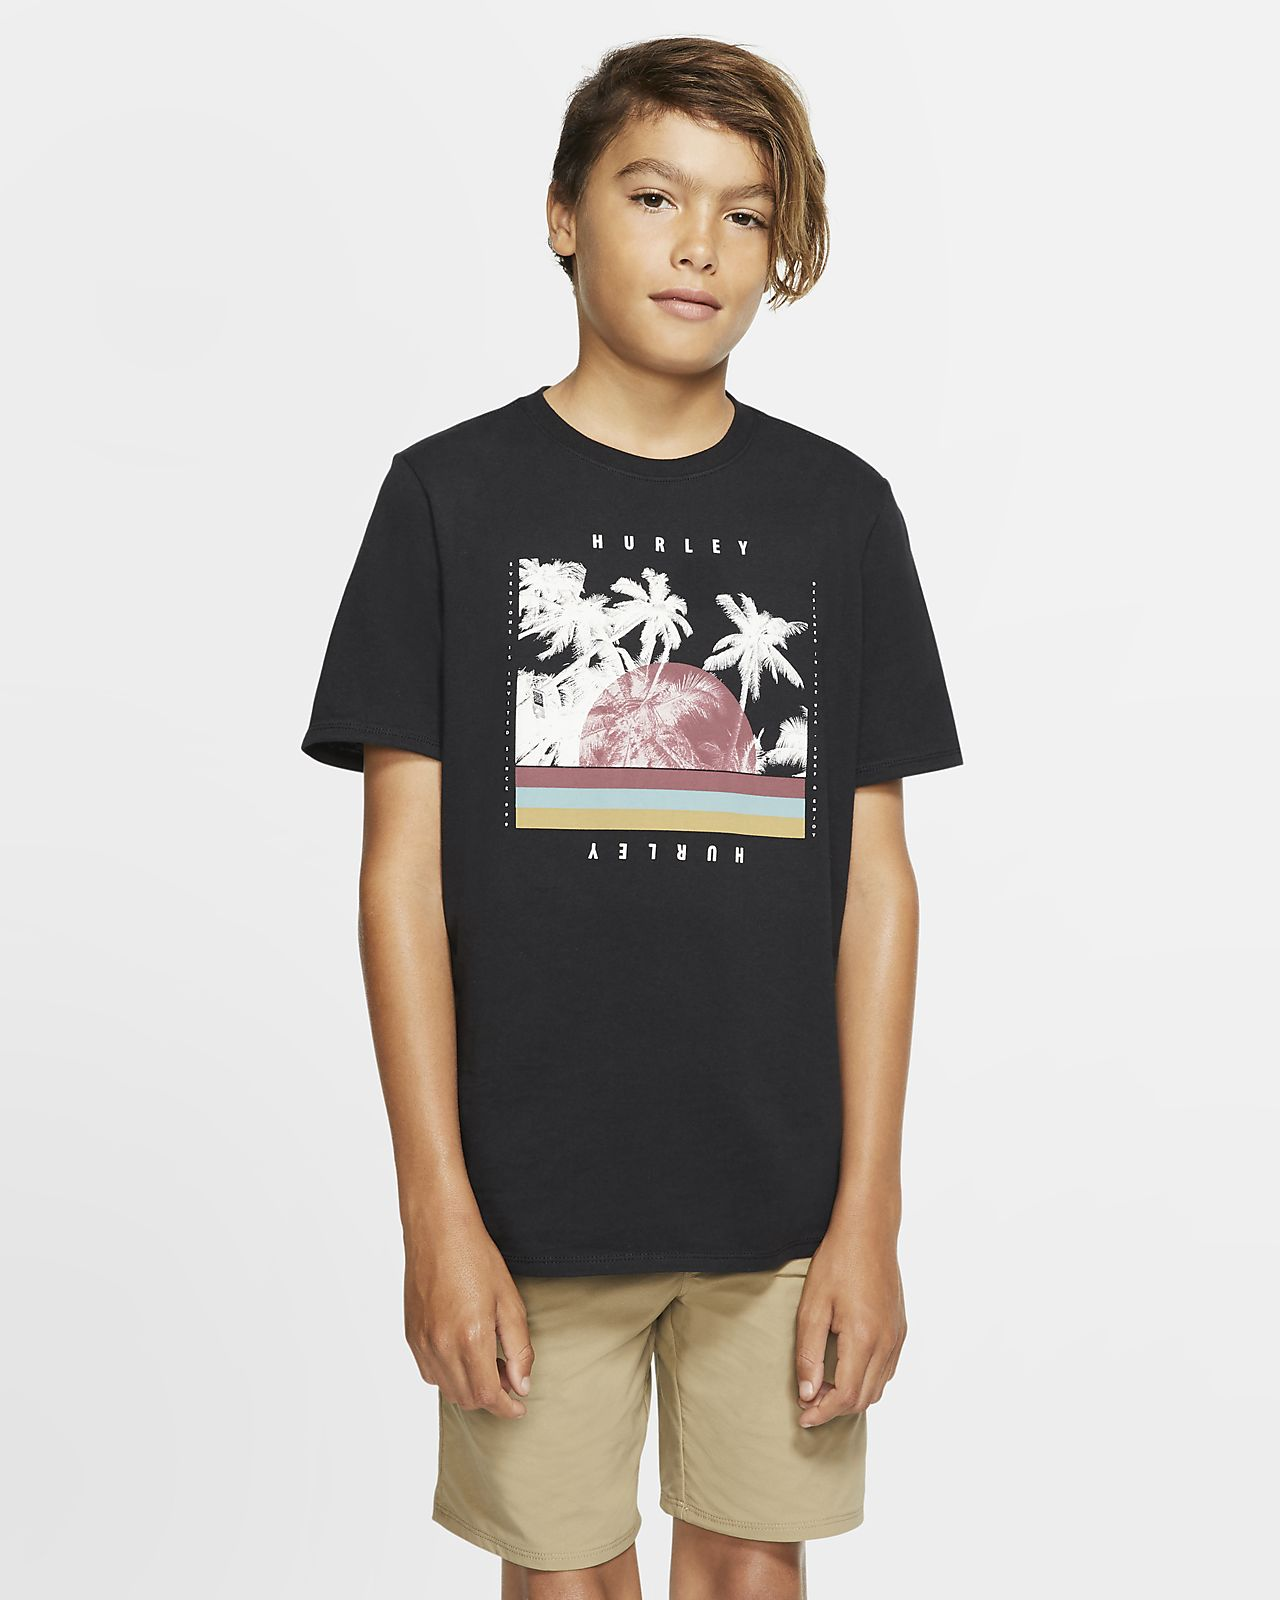 Tee-shirt coupe Premium Hurley Premium Palm Retro pour Garçon